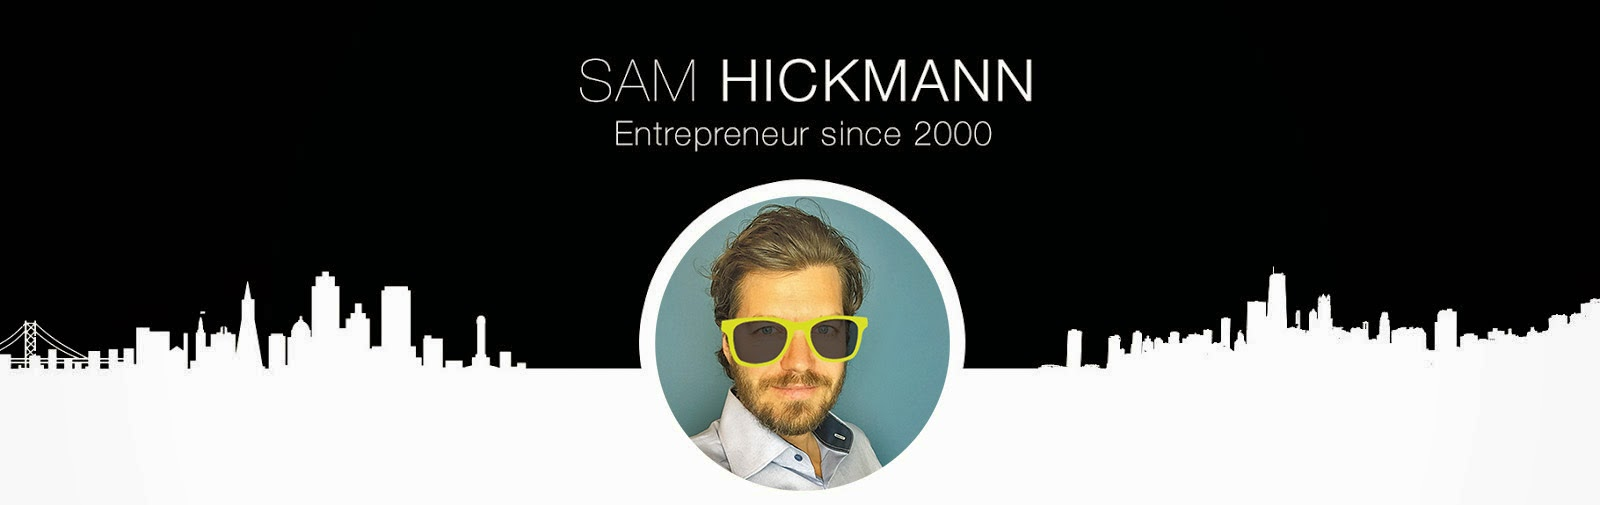 Sam Hickmann_